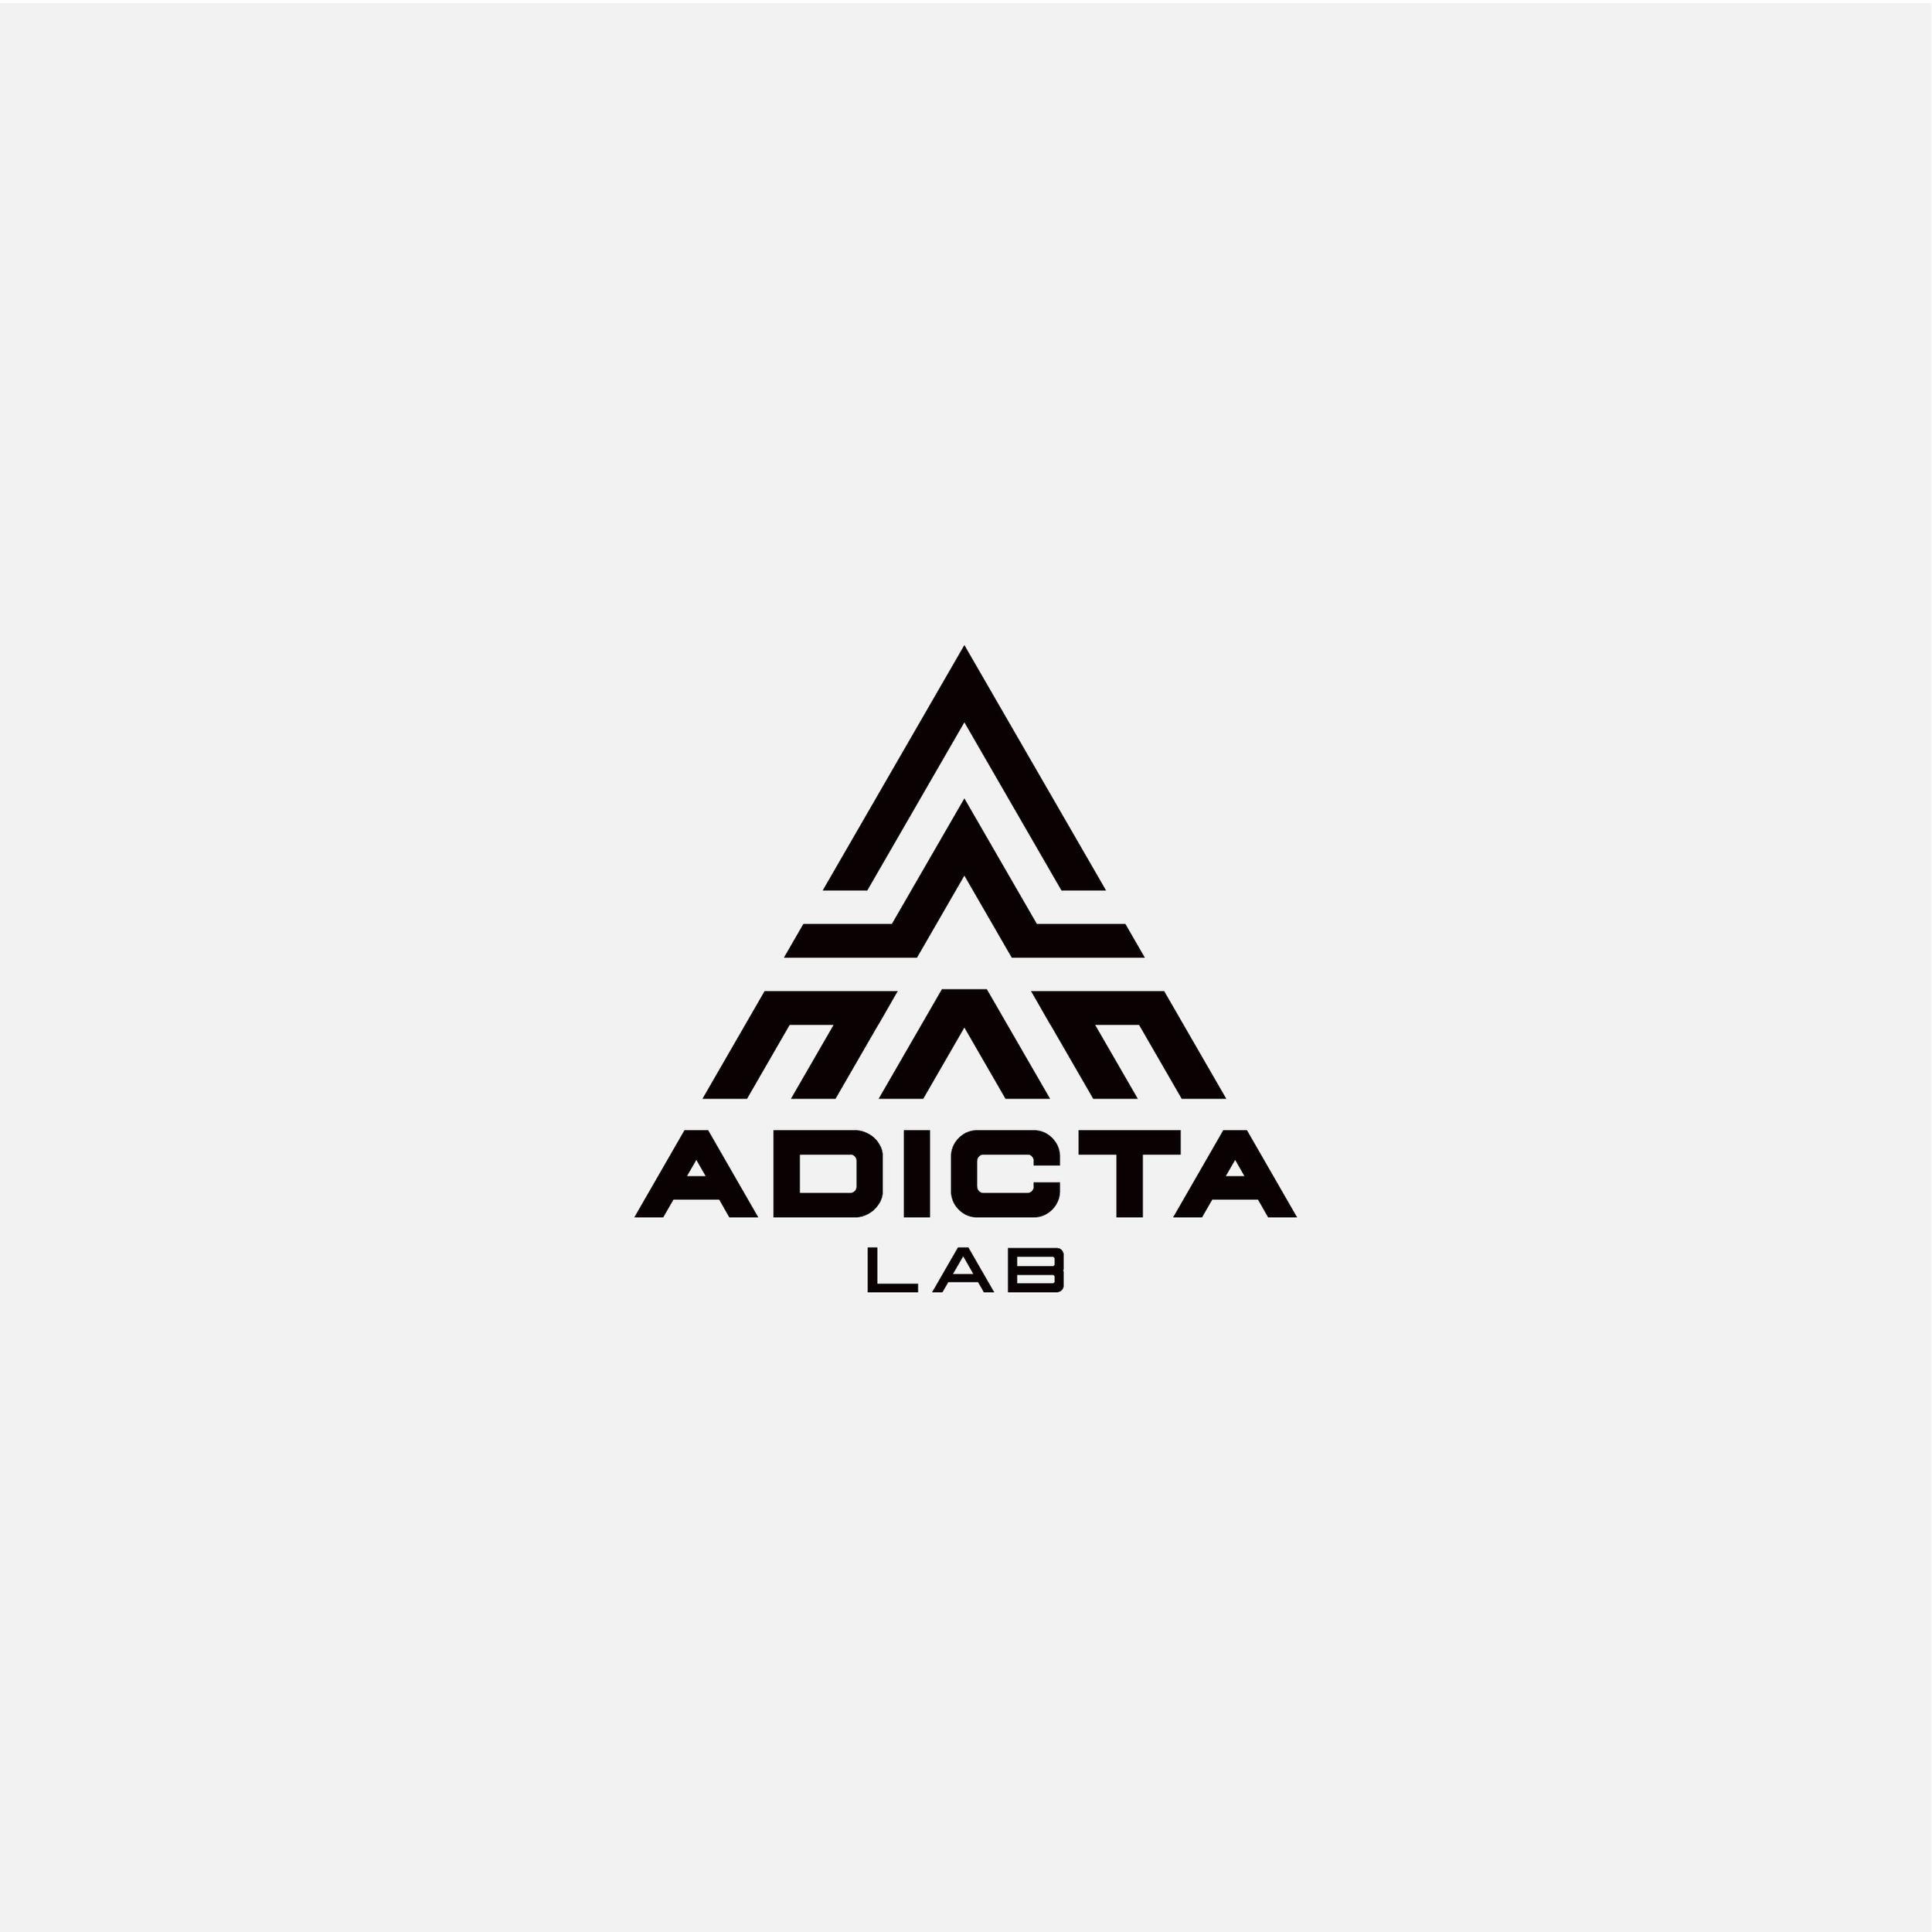 Adicta.jpg